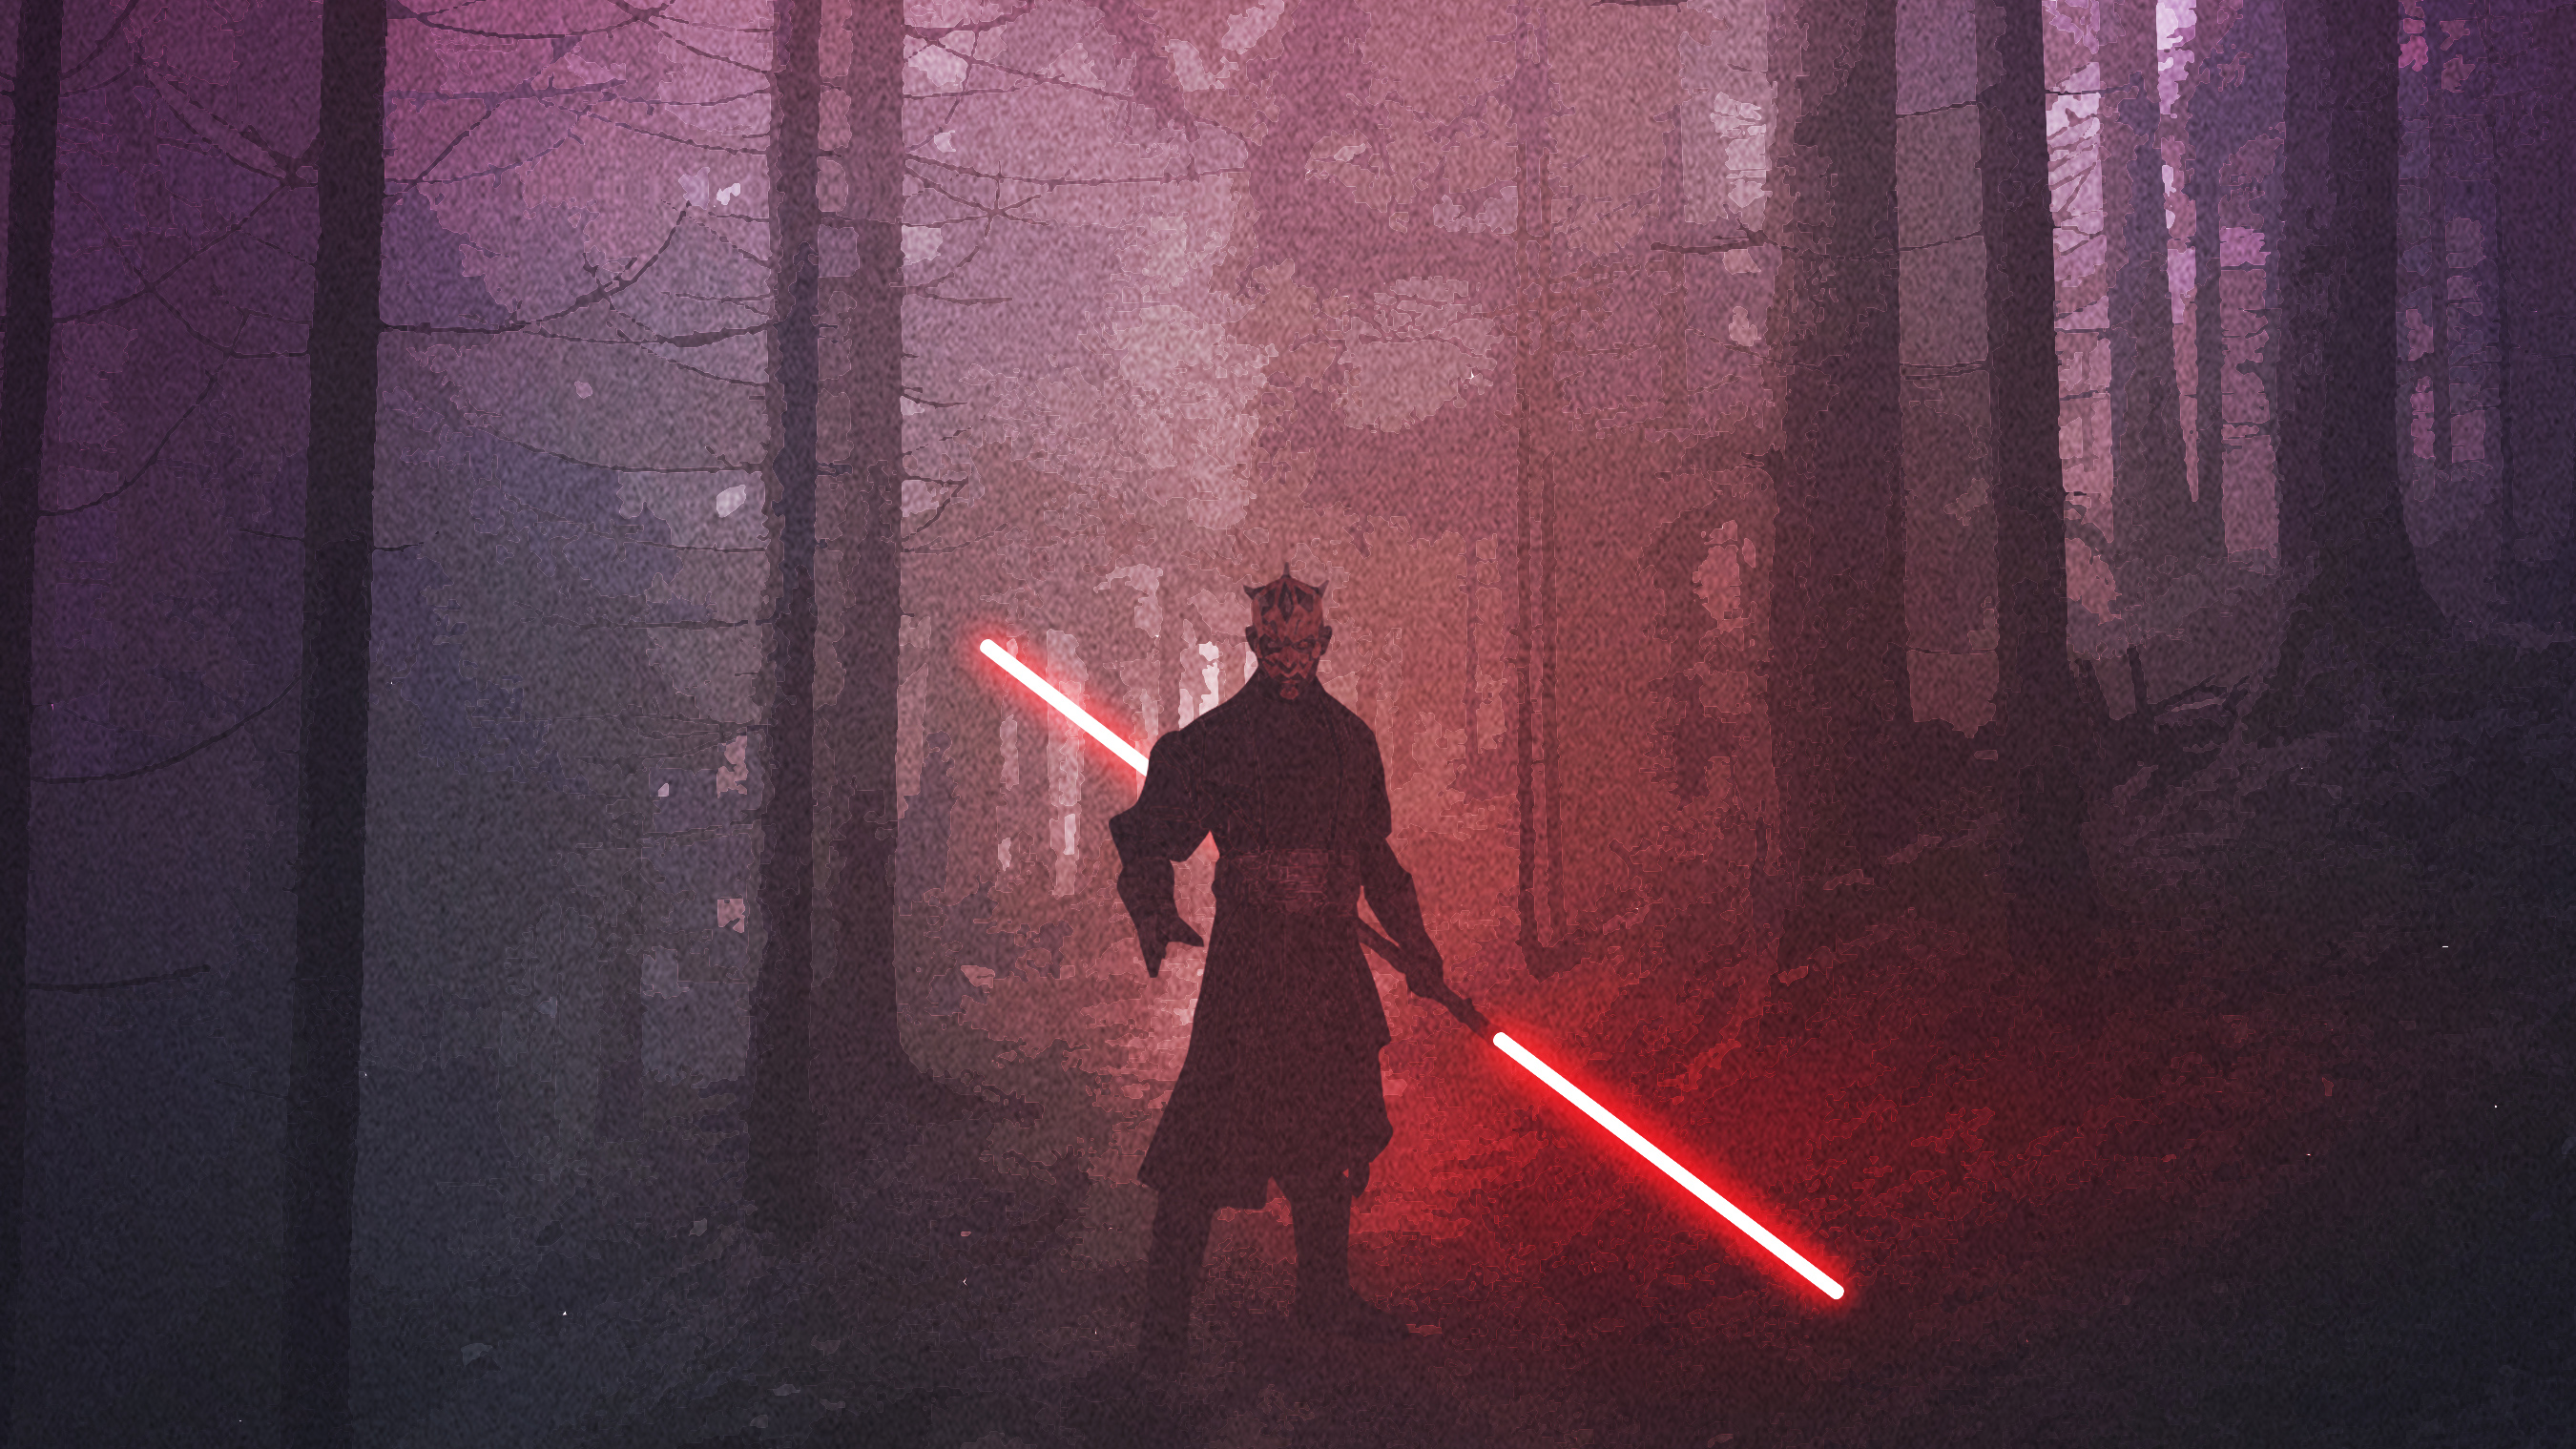 2048x1152 Darth Maul Star Wars Fanart 2048x1152 Resolution Hd 4k